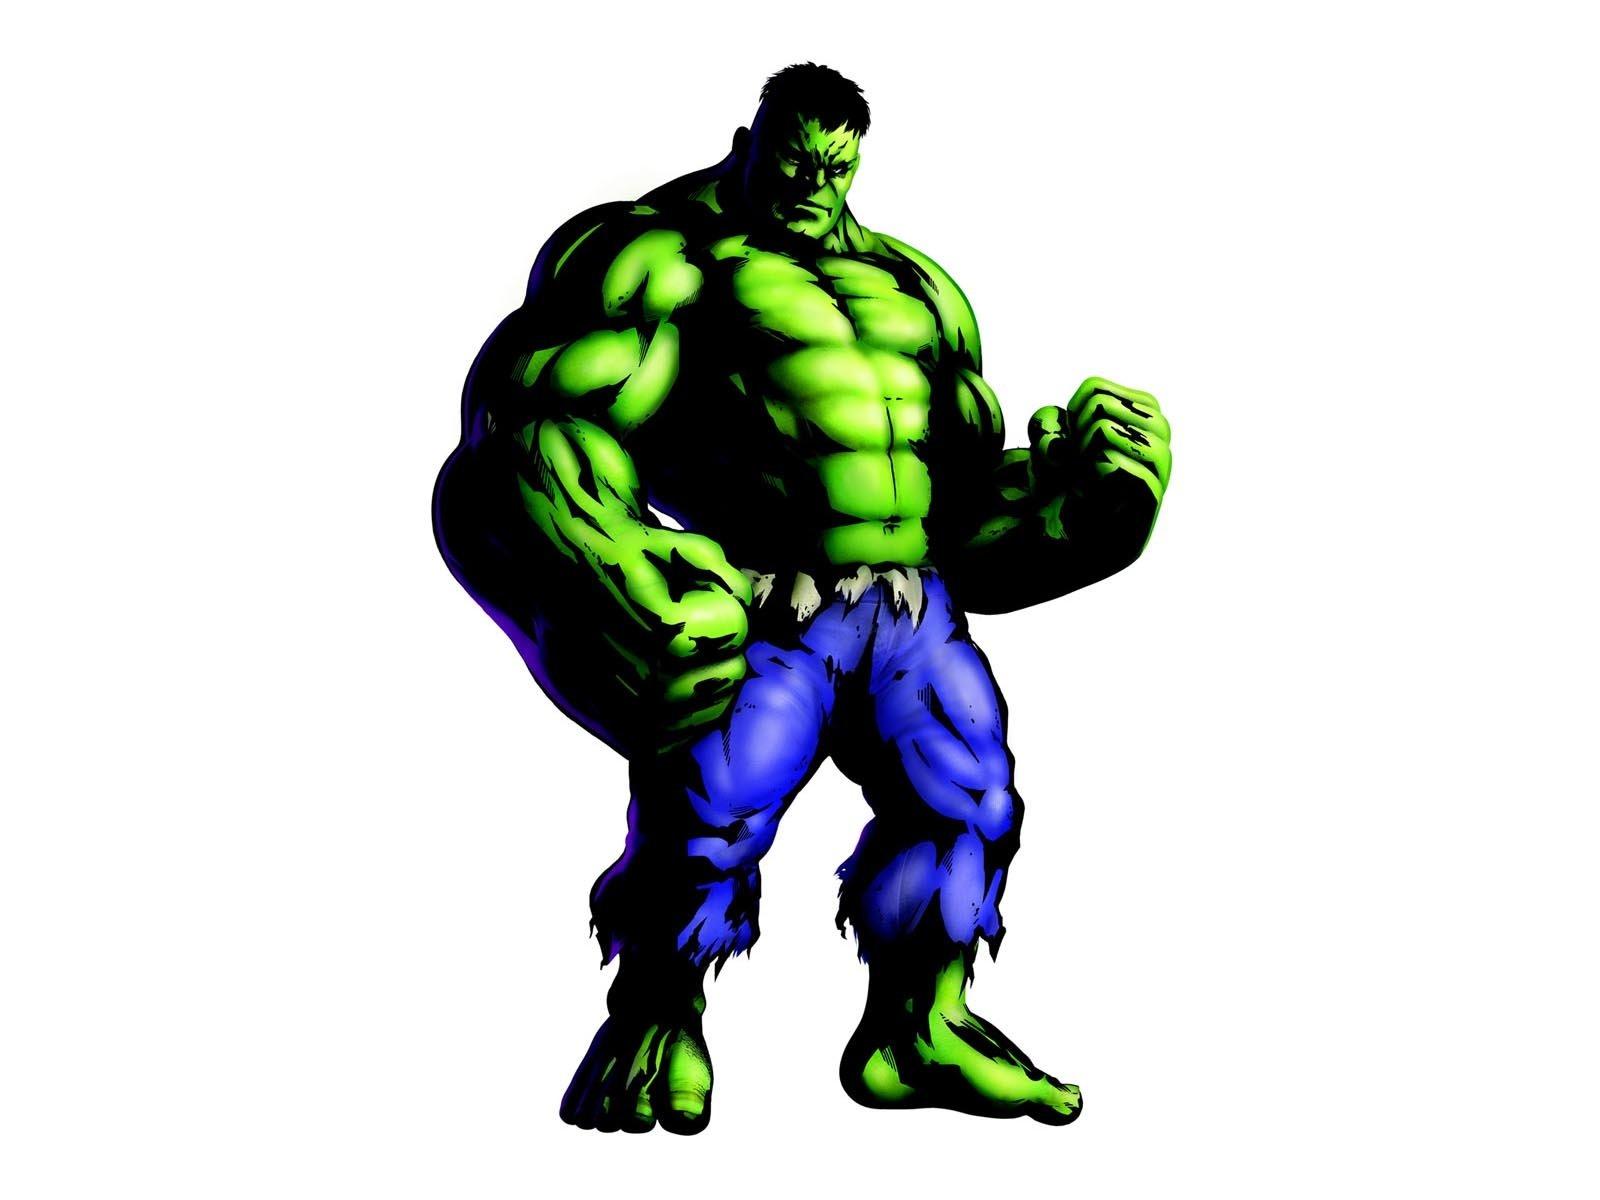 Hulk fond d 39 cran and arri re plan 1600x1200 id 99733 - Telecharger hulk ...